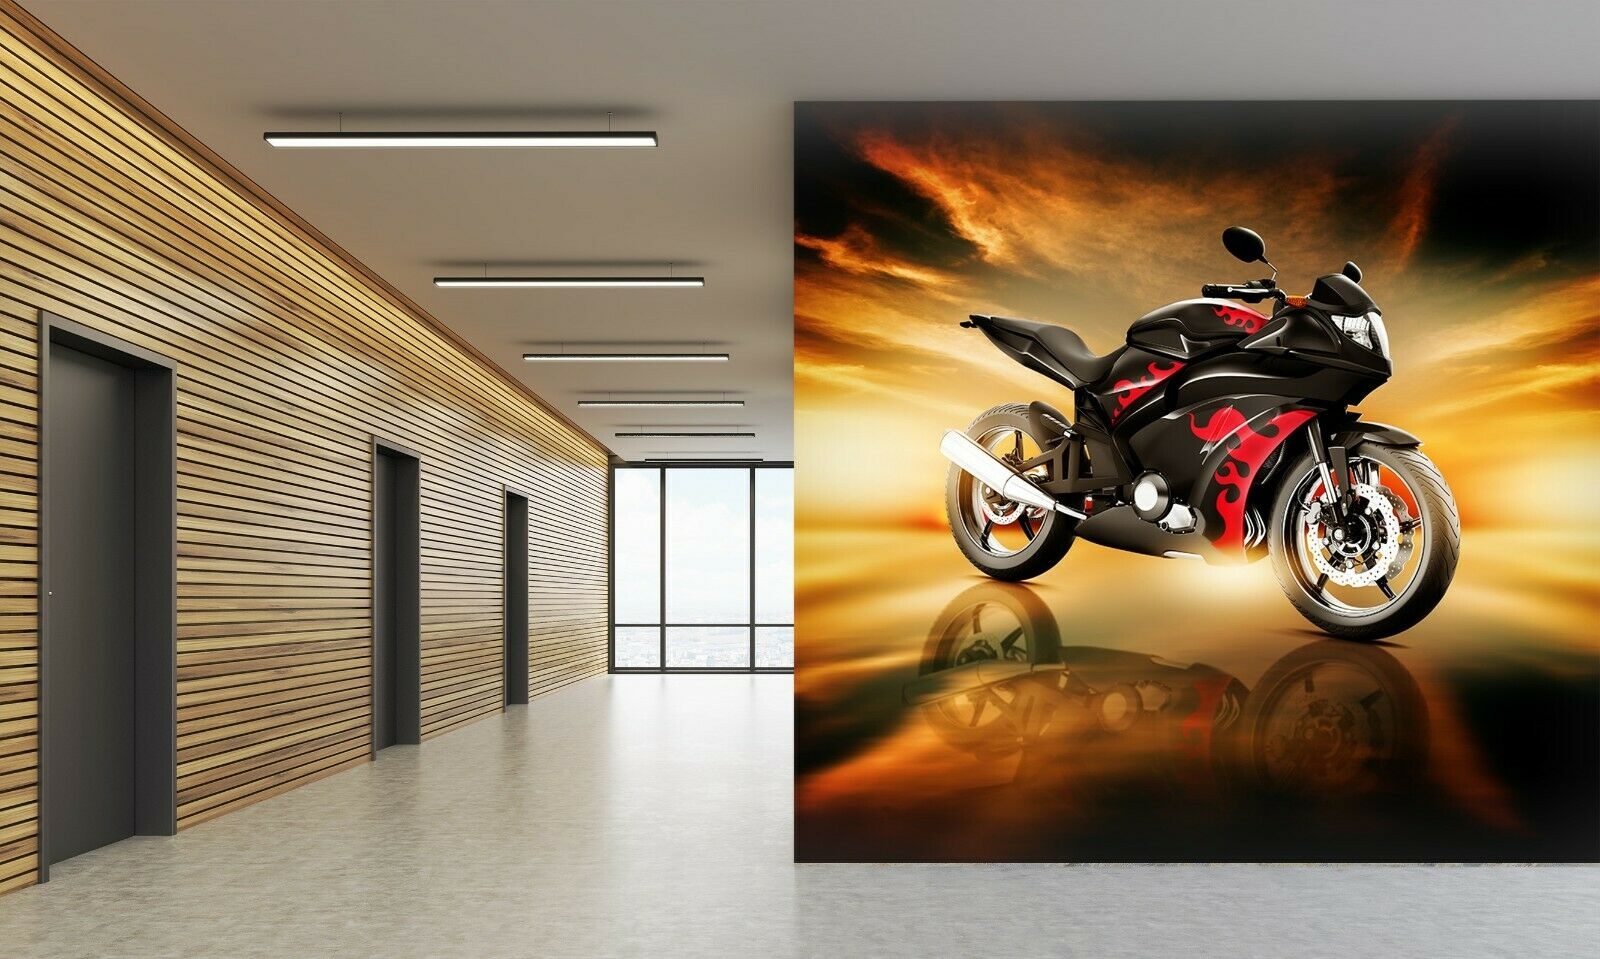 3D Motorrad O29 Auto Tapete Wandbild Selbstklebend Abnehmbare Angelia